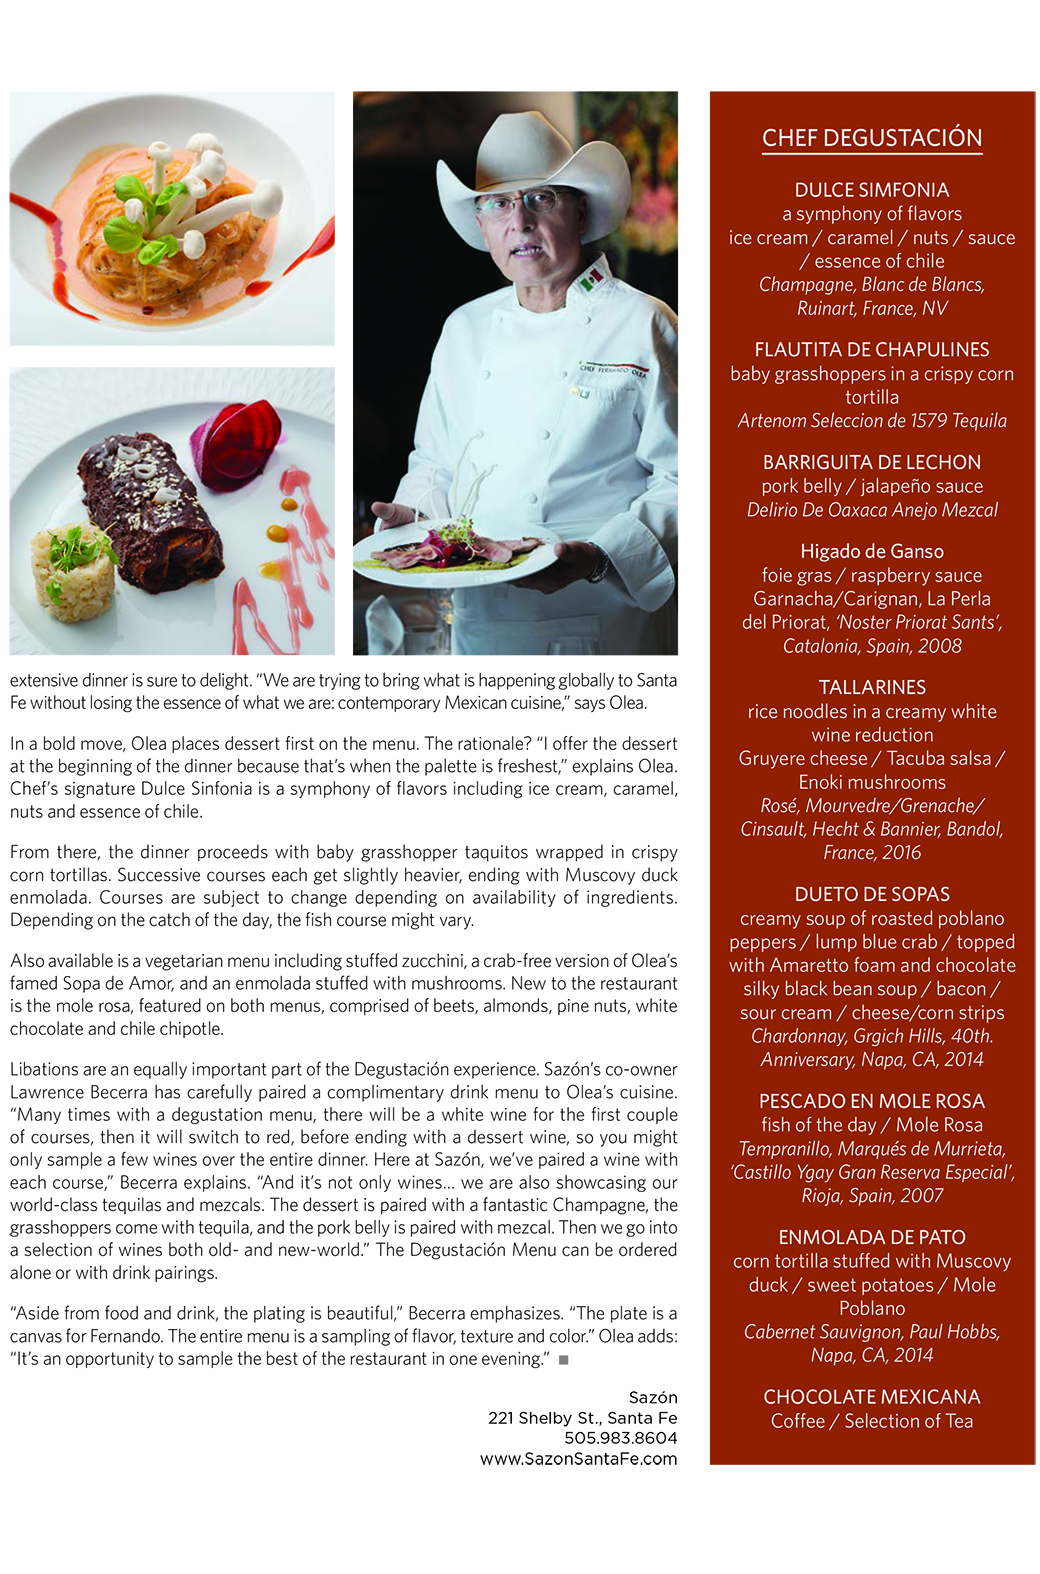 degustacion-page2